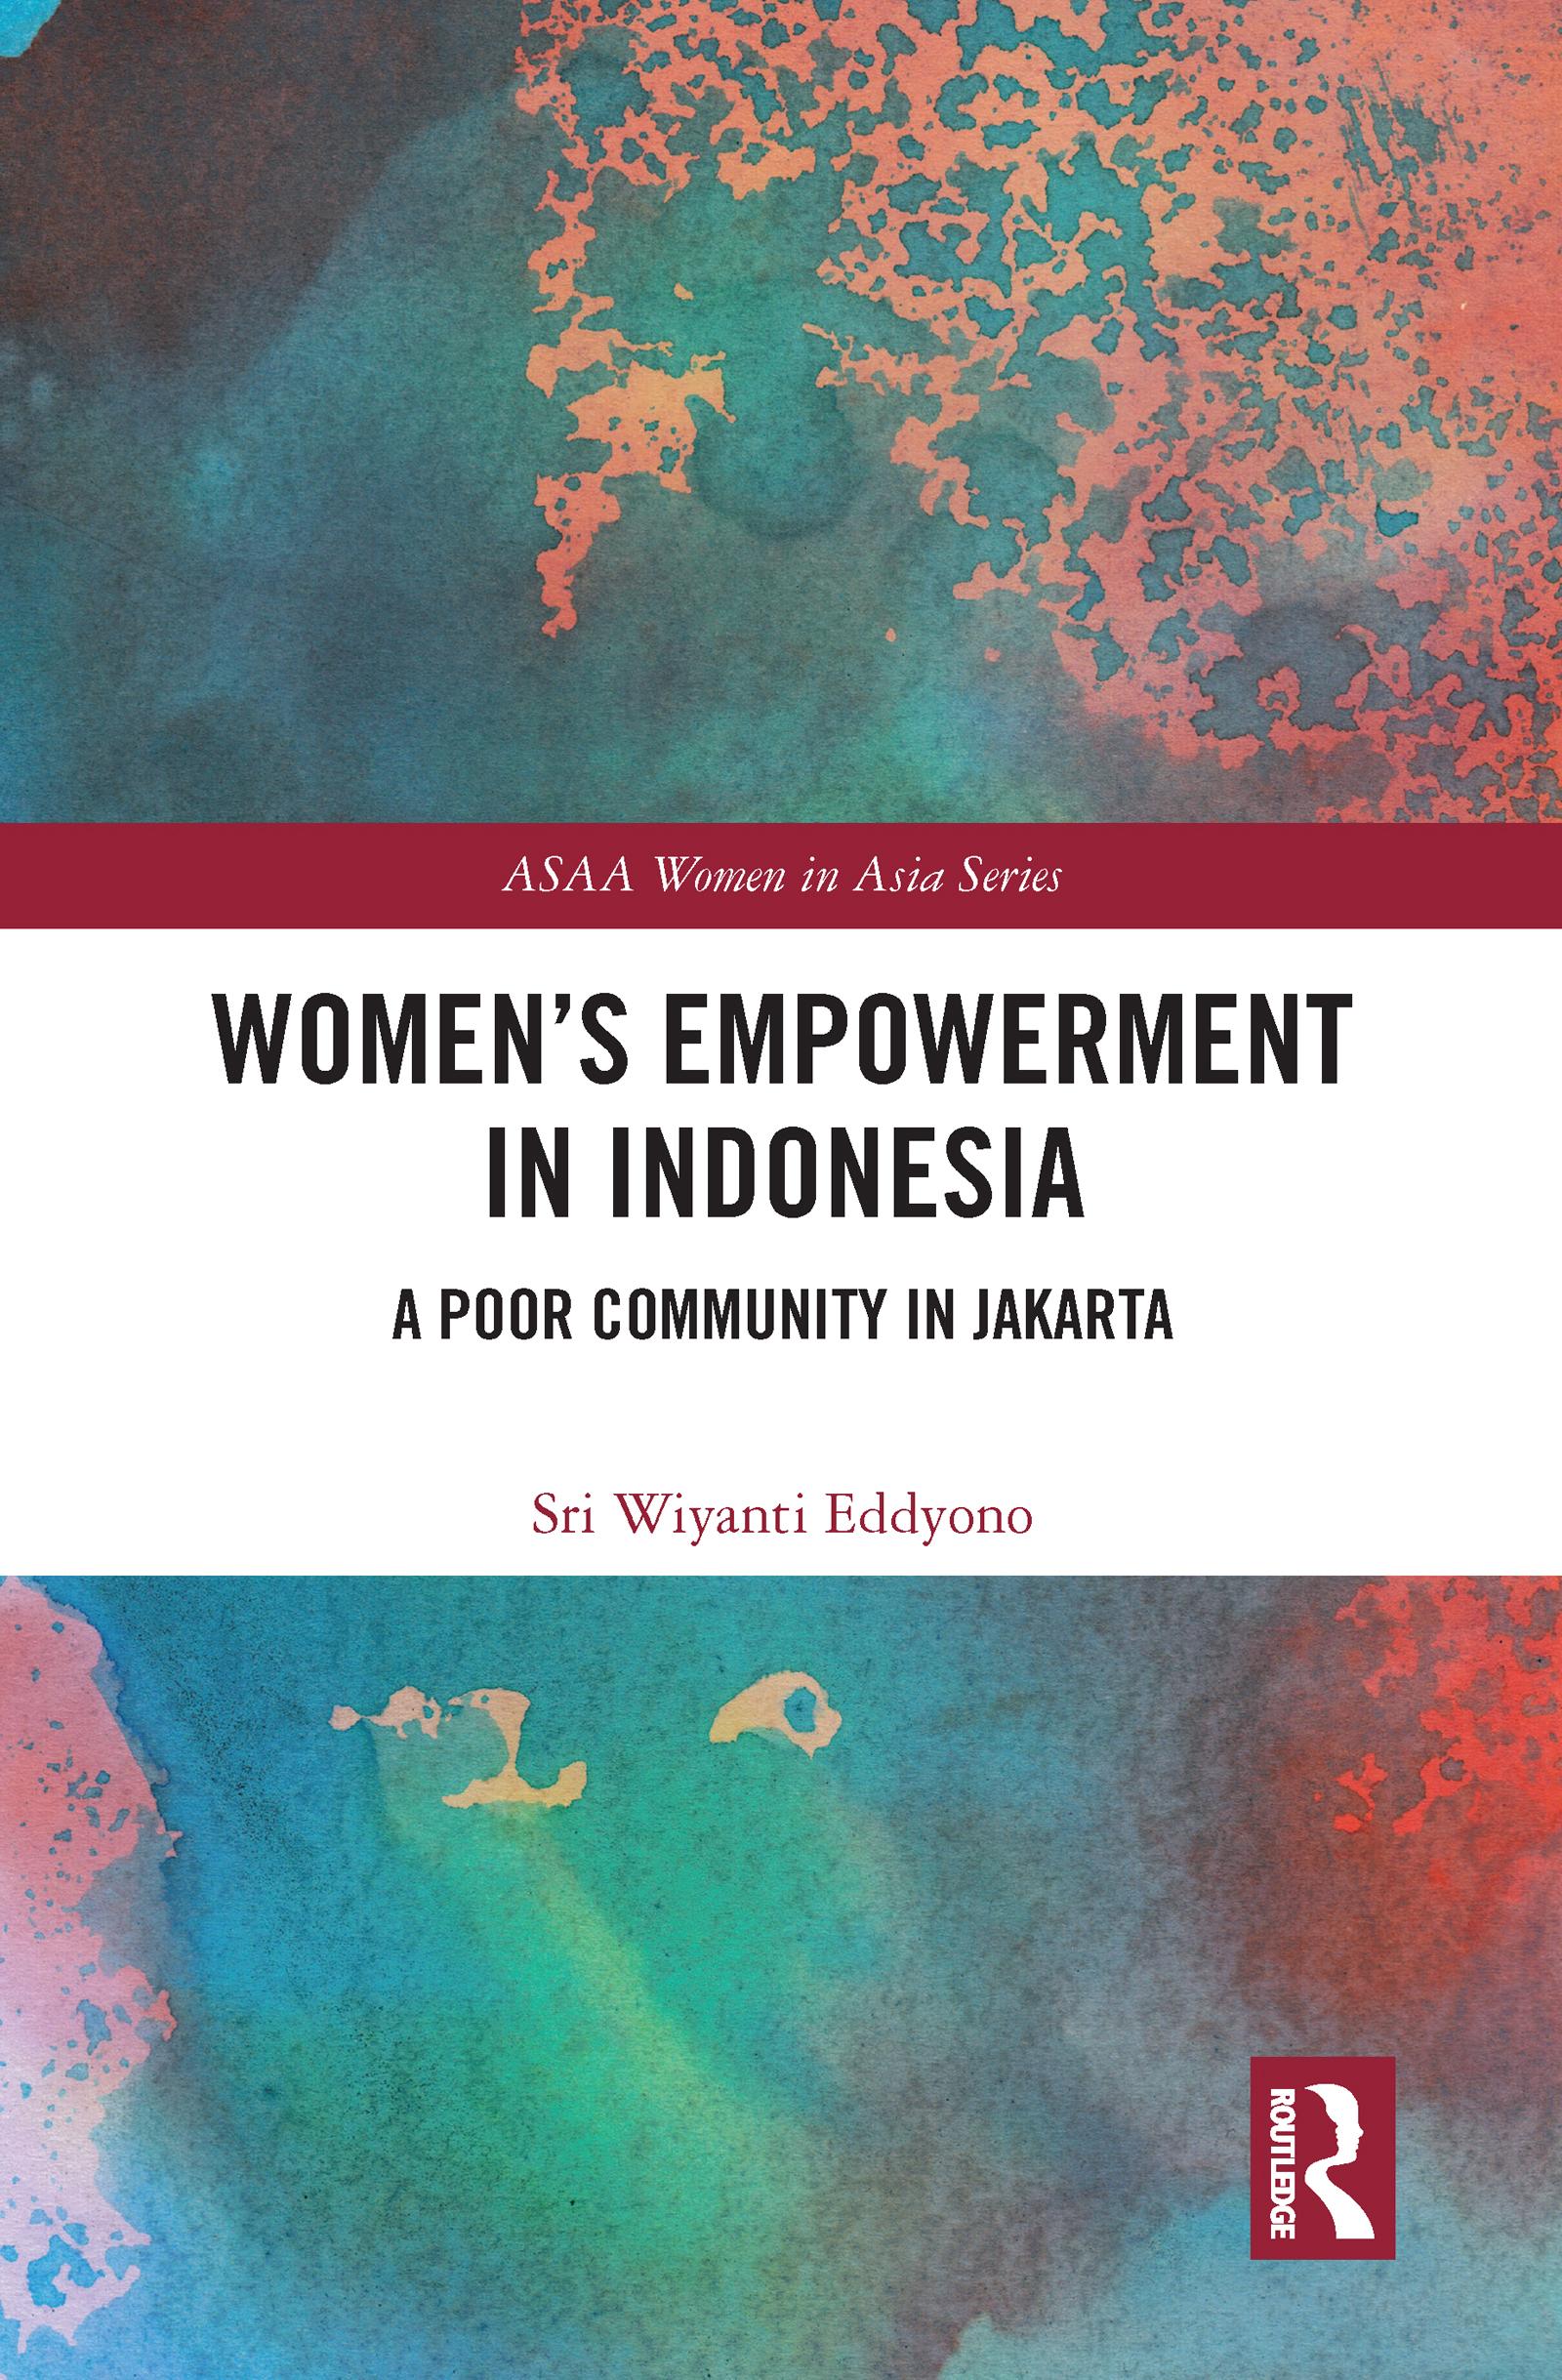 Women's Empowerment in Indonesia